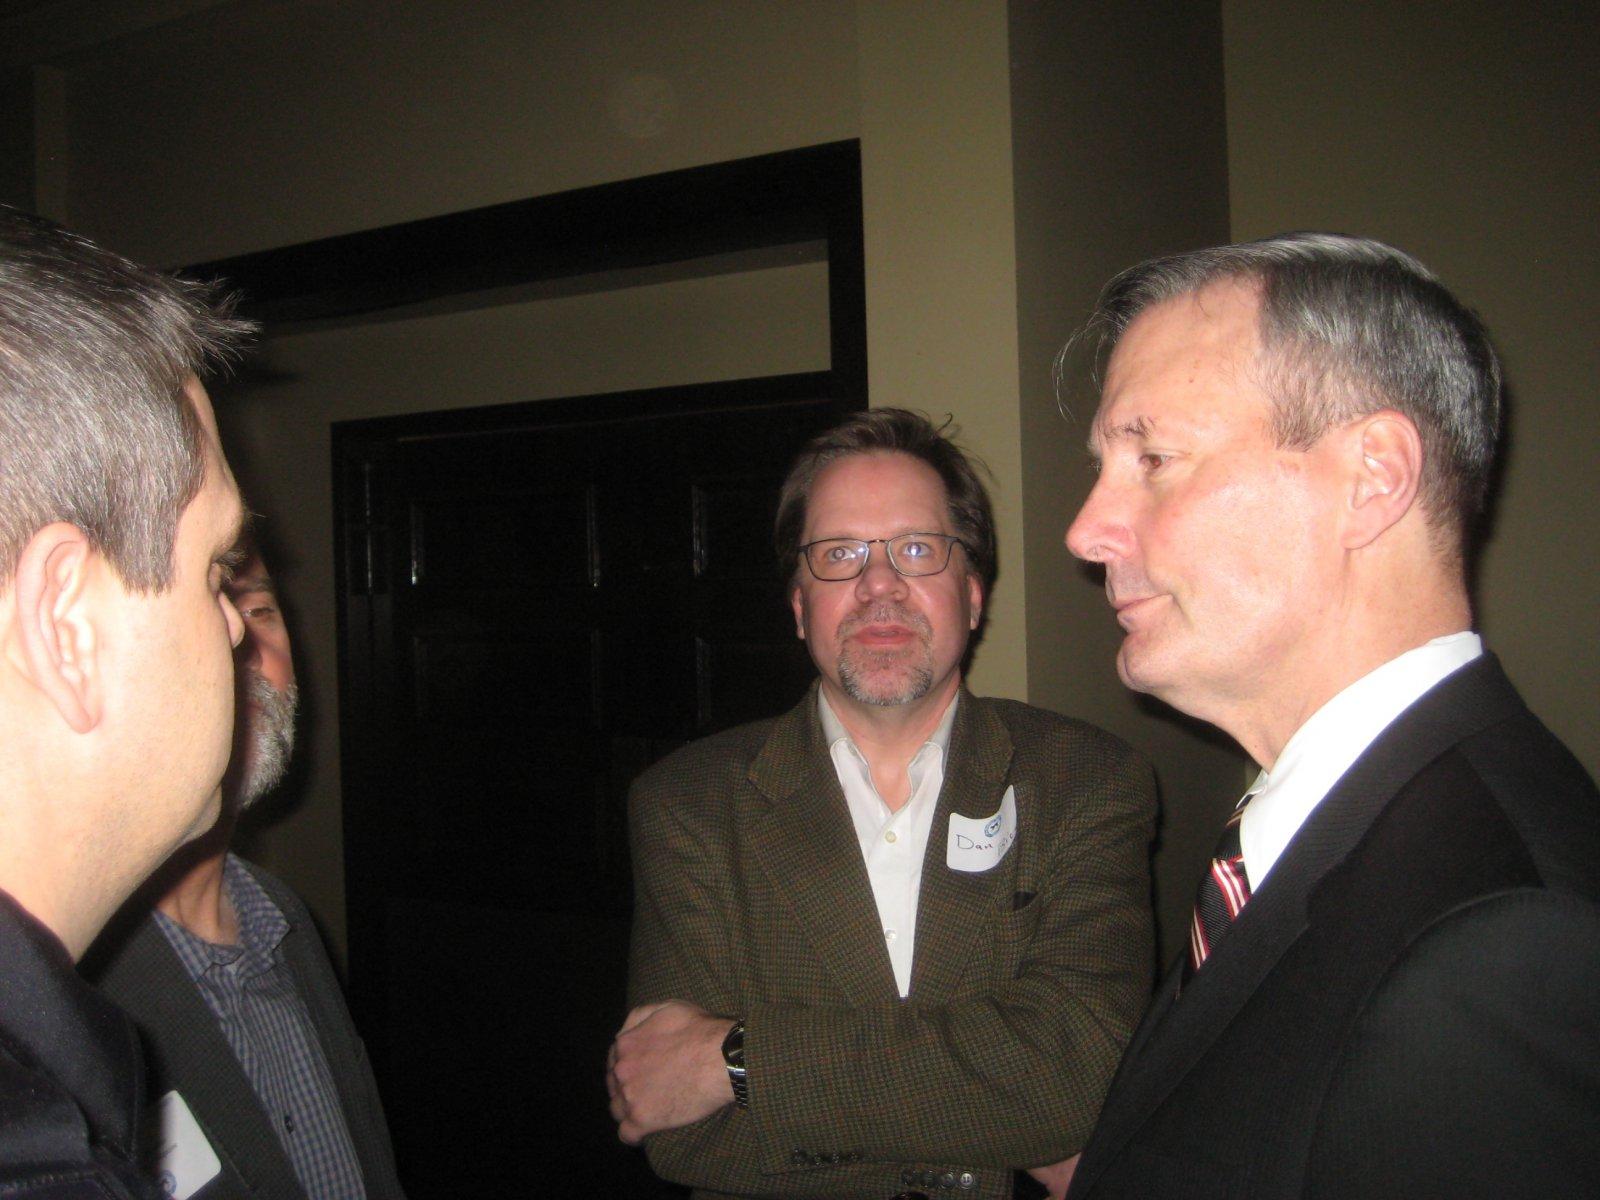 Dan Bice and Chief Ed Flynn